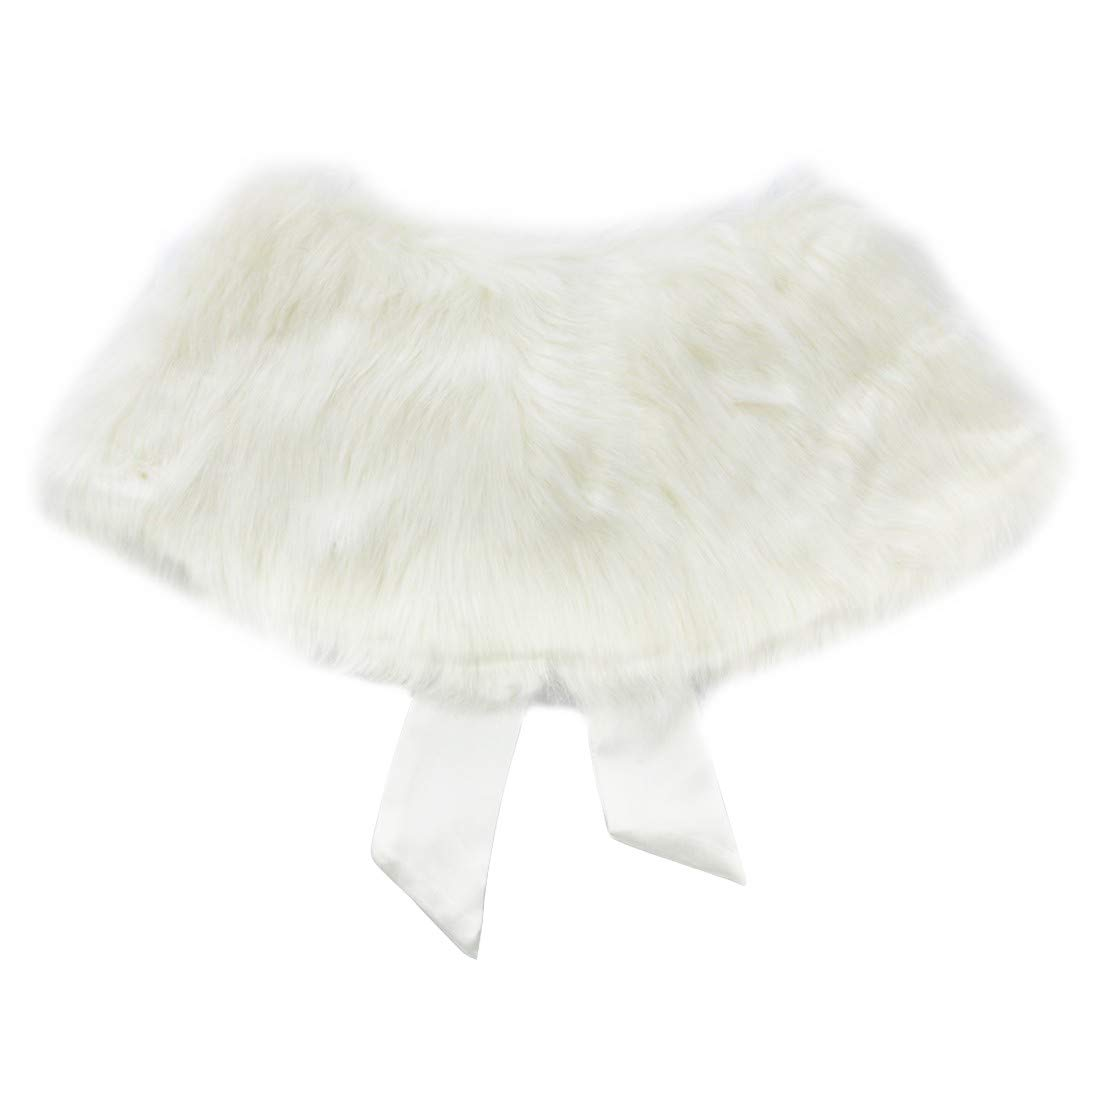 ranrann Kids Flower Girls Faux Fur Shawl Wrap Tippet Wedding Bridesmaid Bolero Shrug Princess Cloak Cape Accessories Cover up